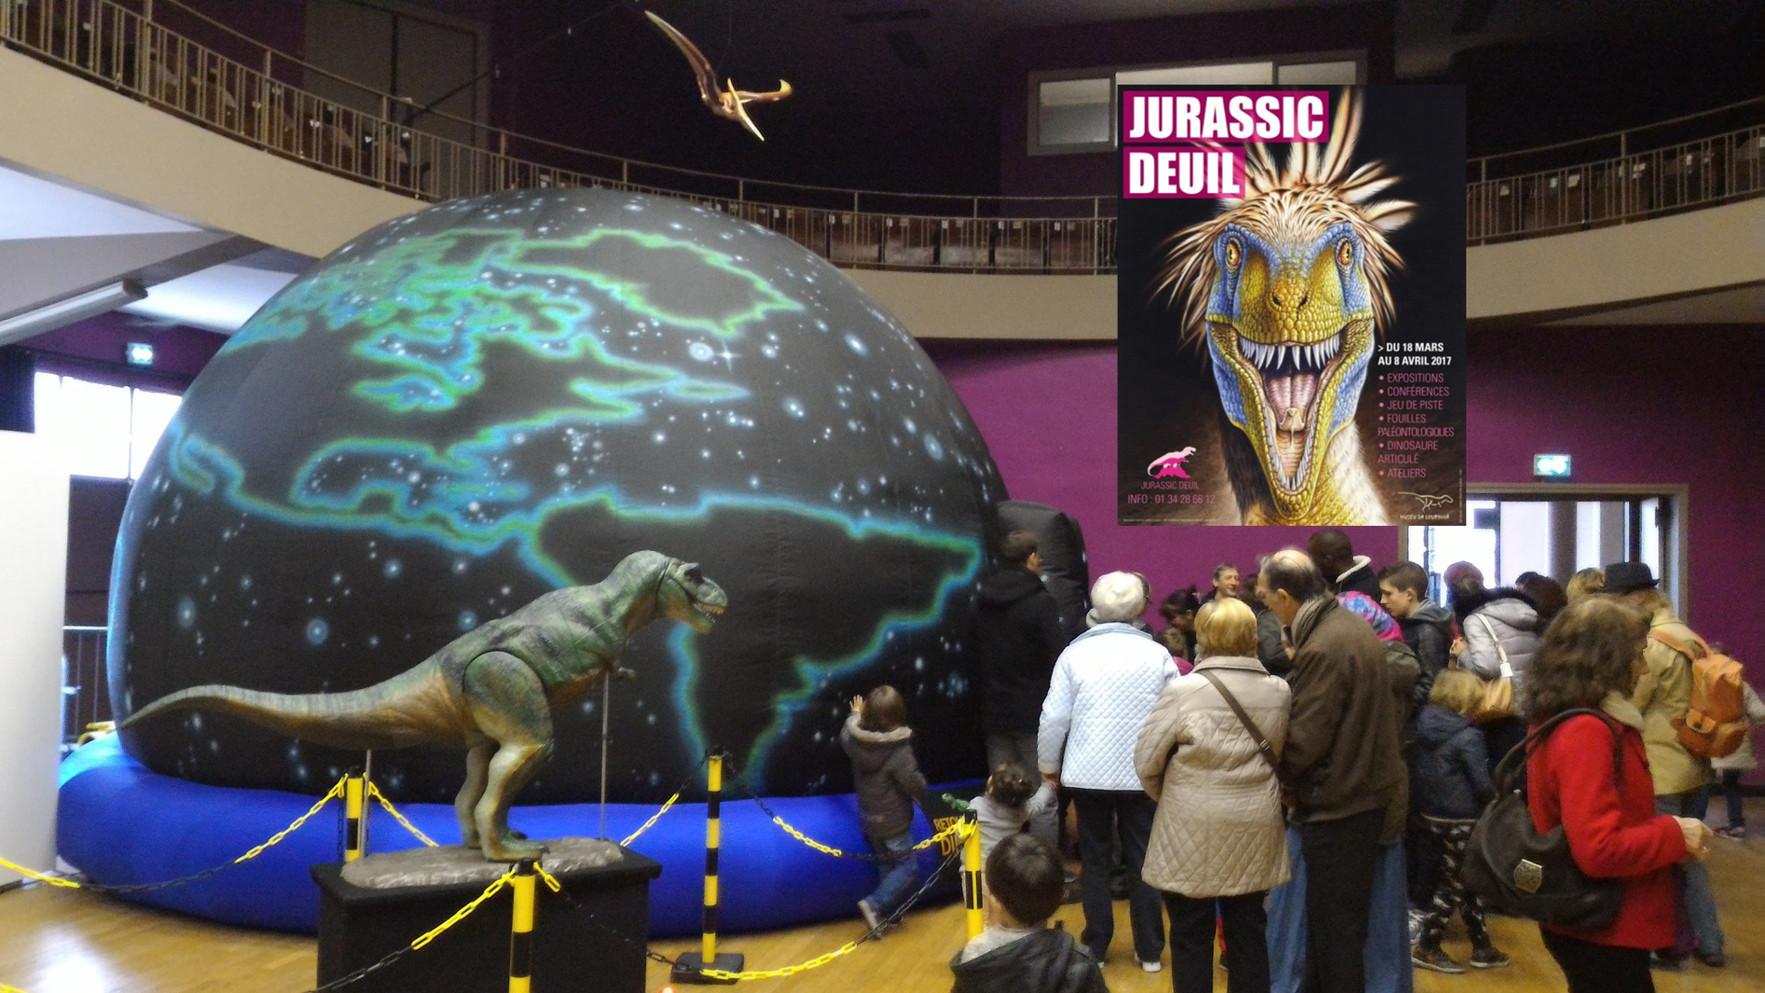 FHD Deuil la Barre Dinosaurs 00.jpg